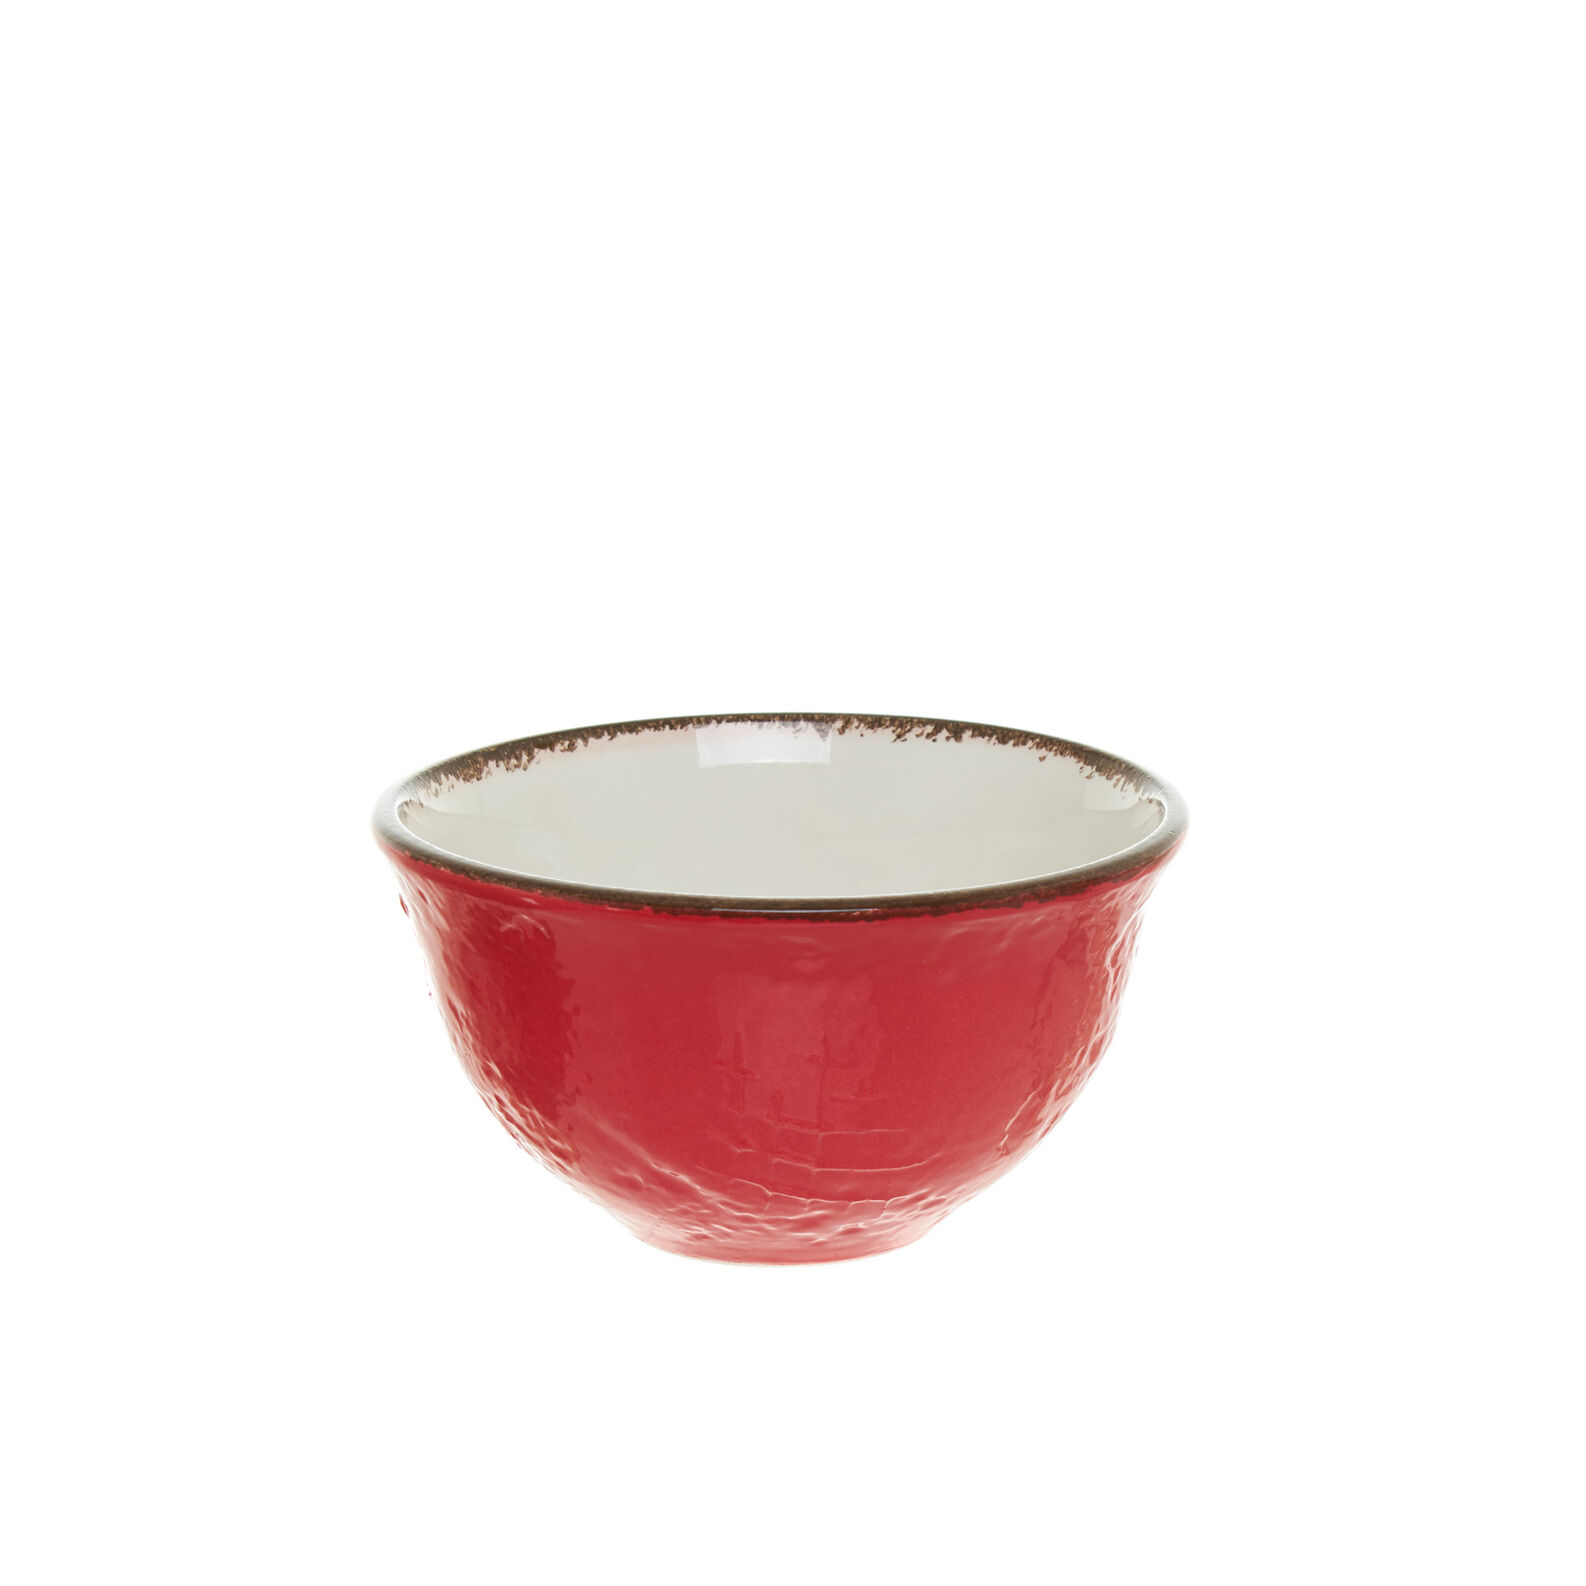 Preta small crafts ceramic bowl